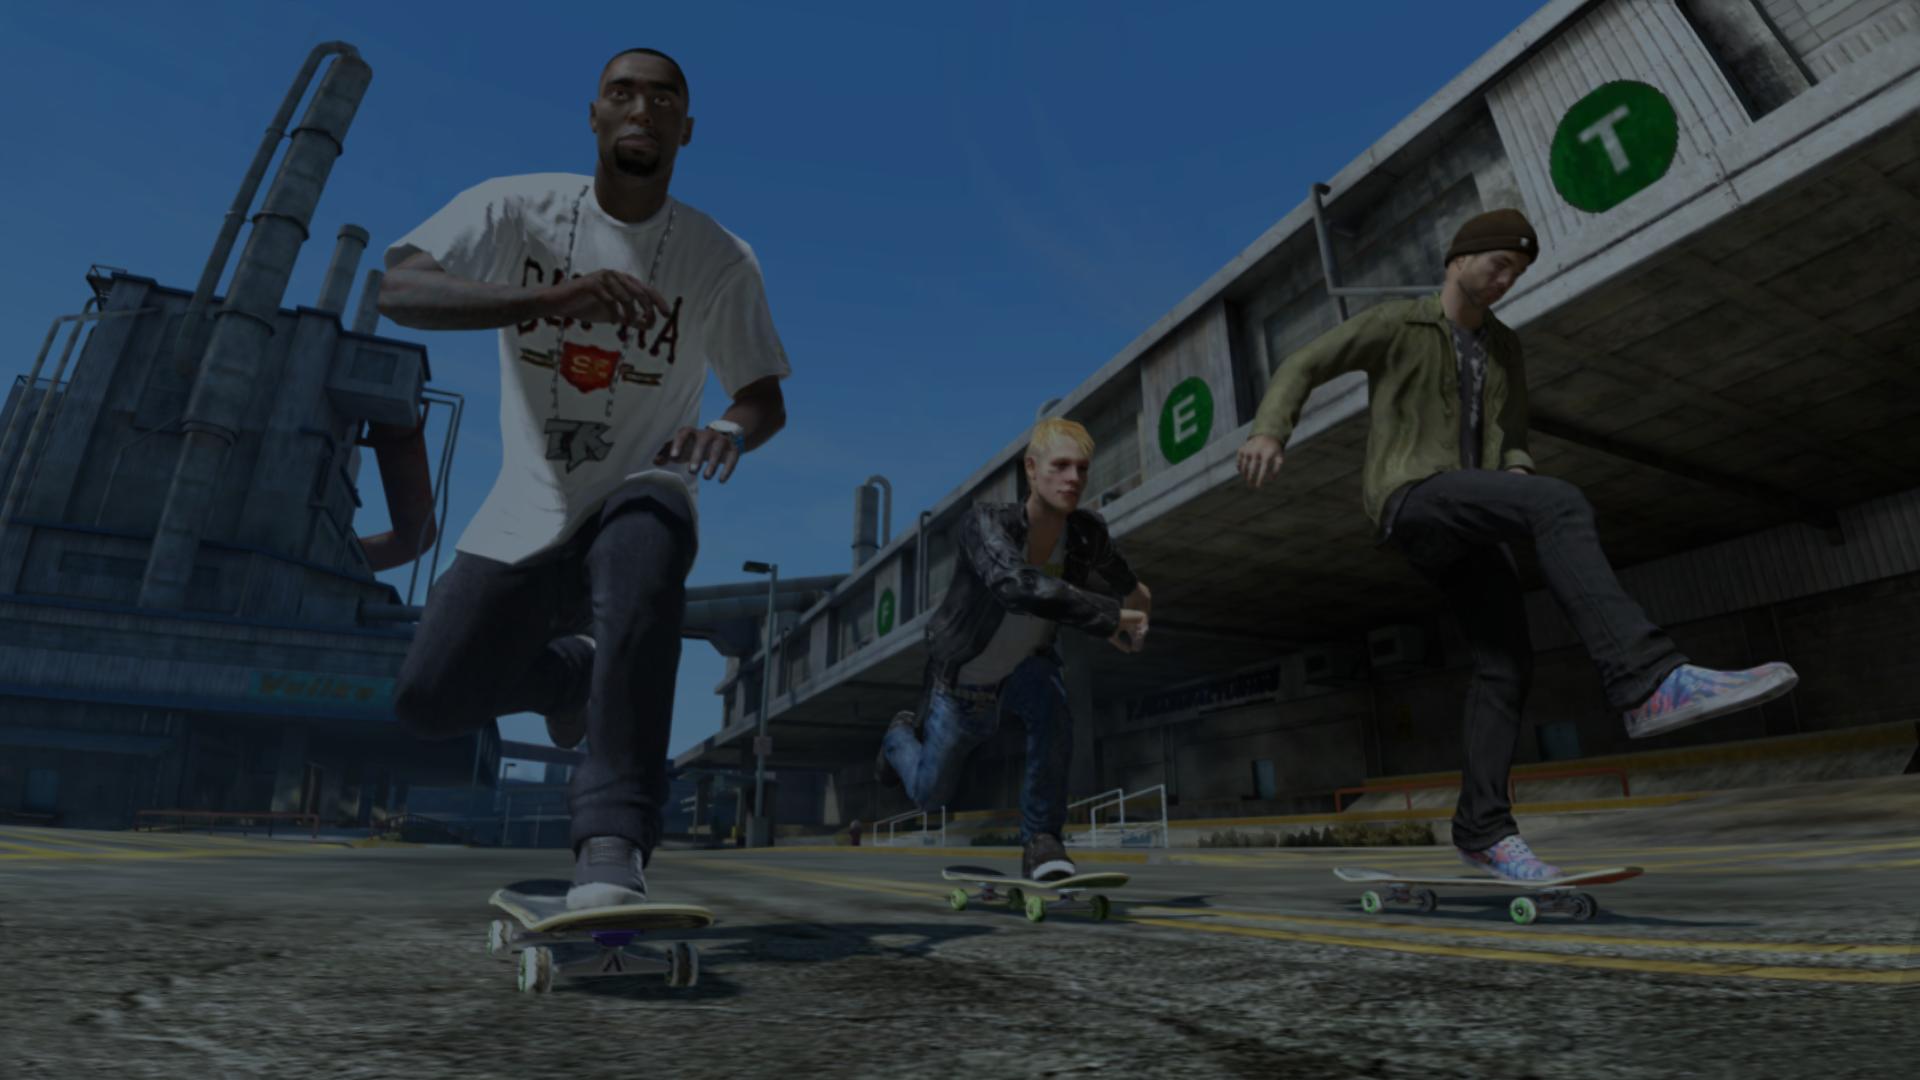 Skate 3 Wallpaper Hd Skate 3 retail